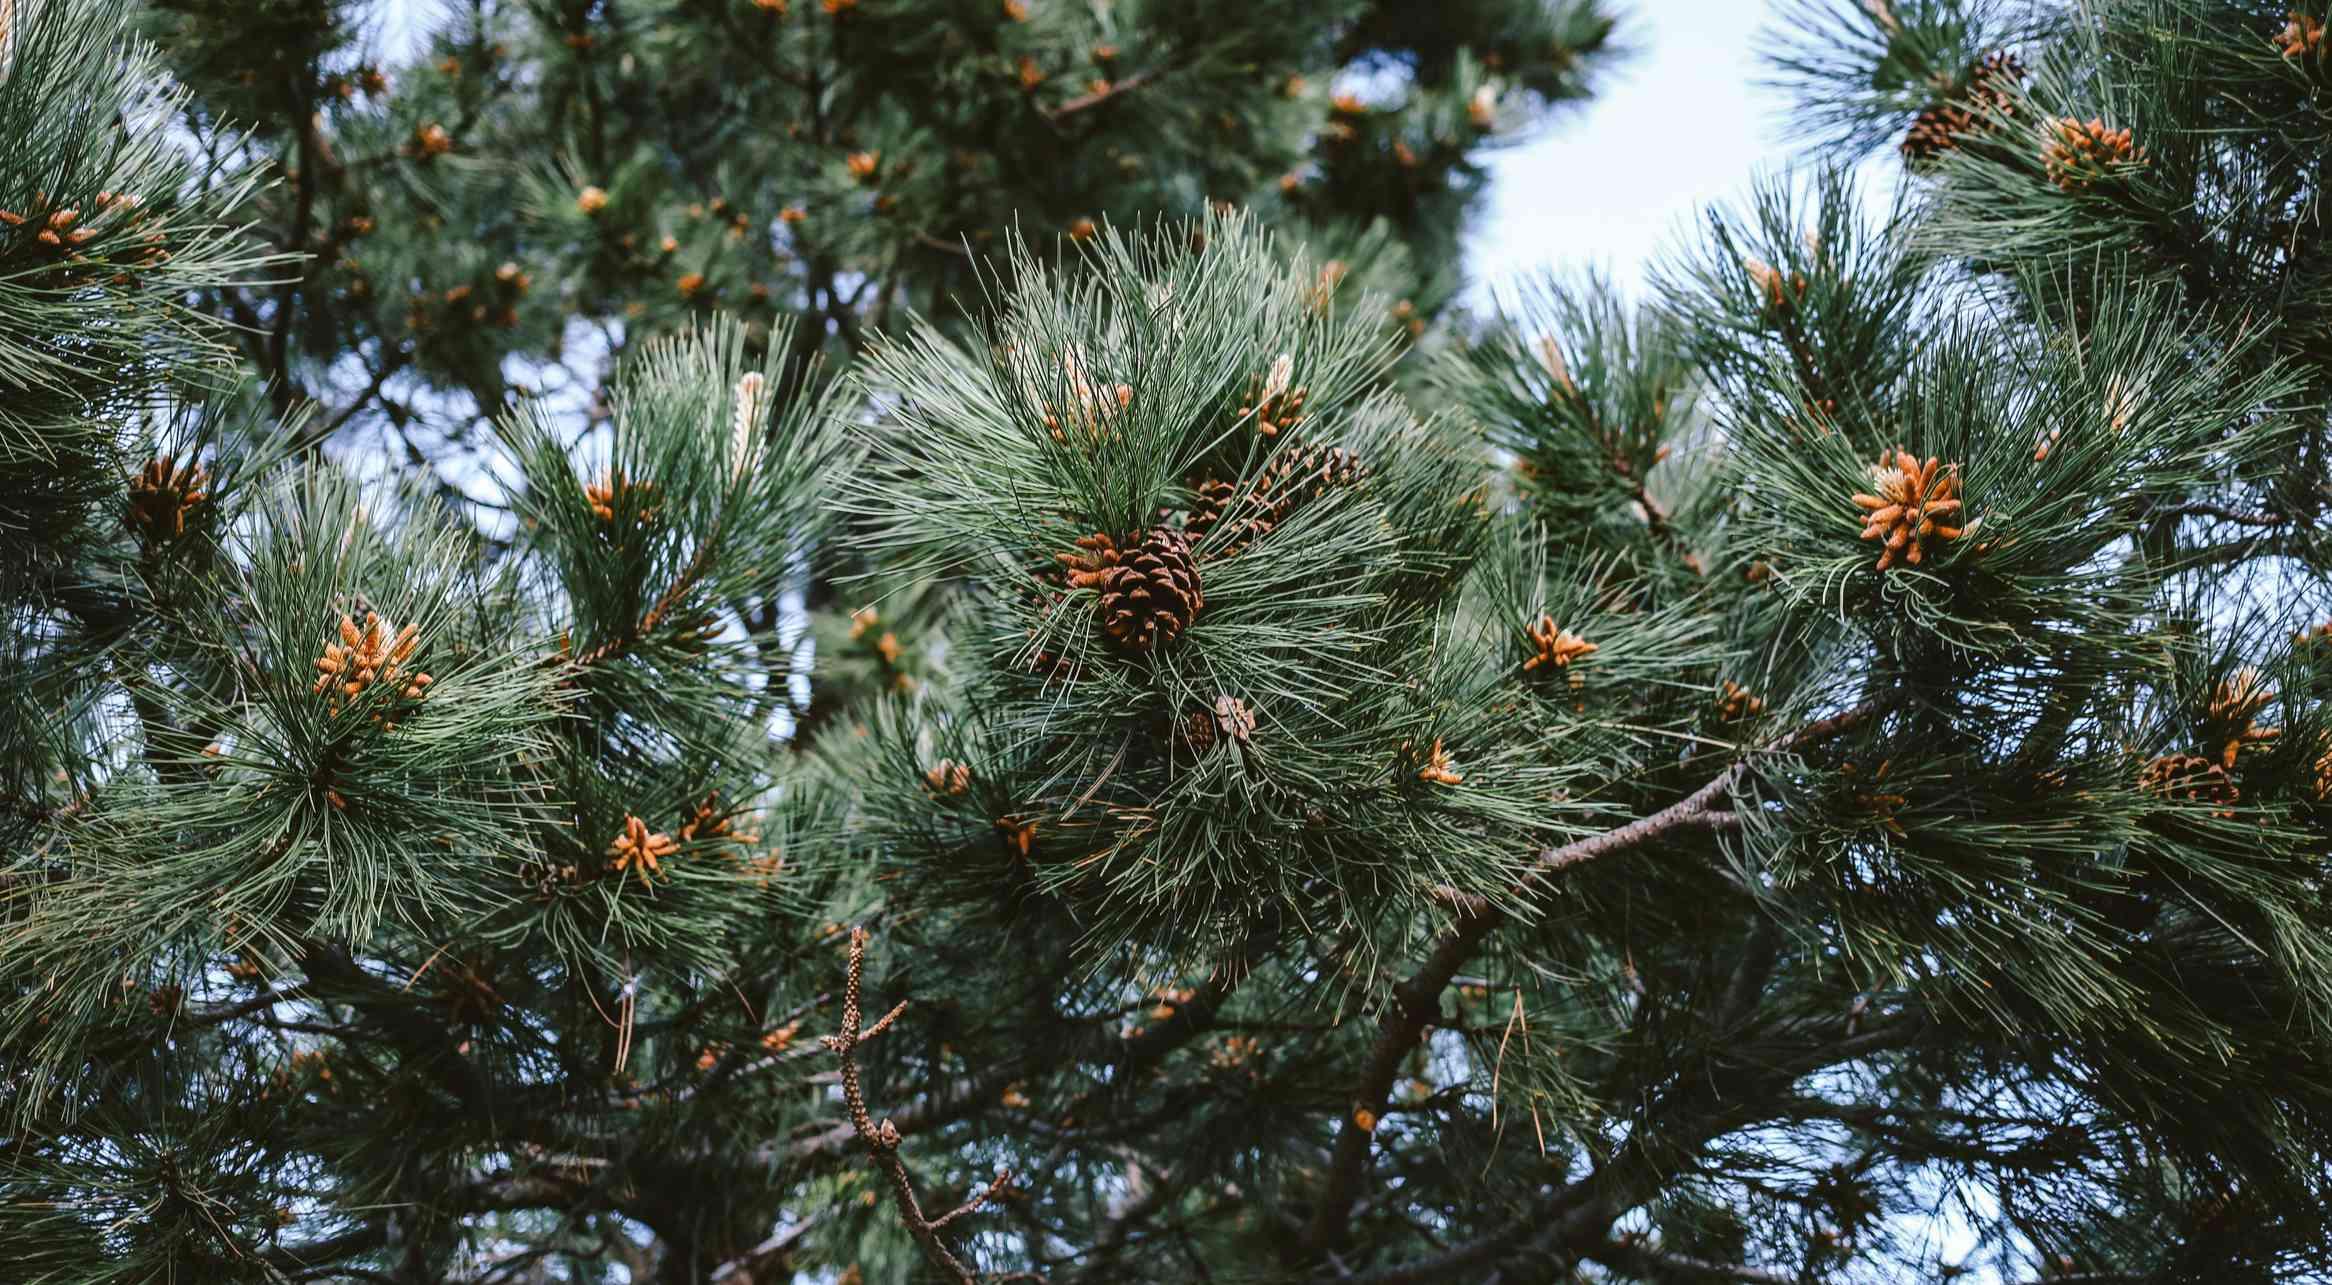 Pond pine tree